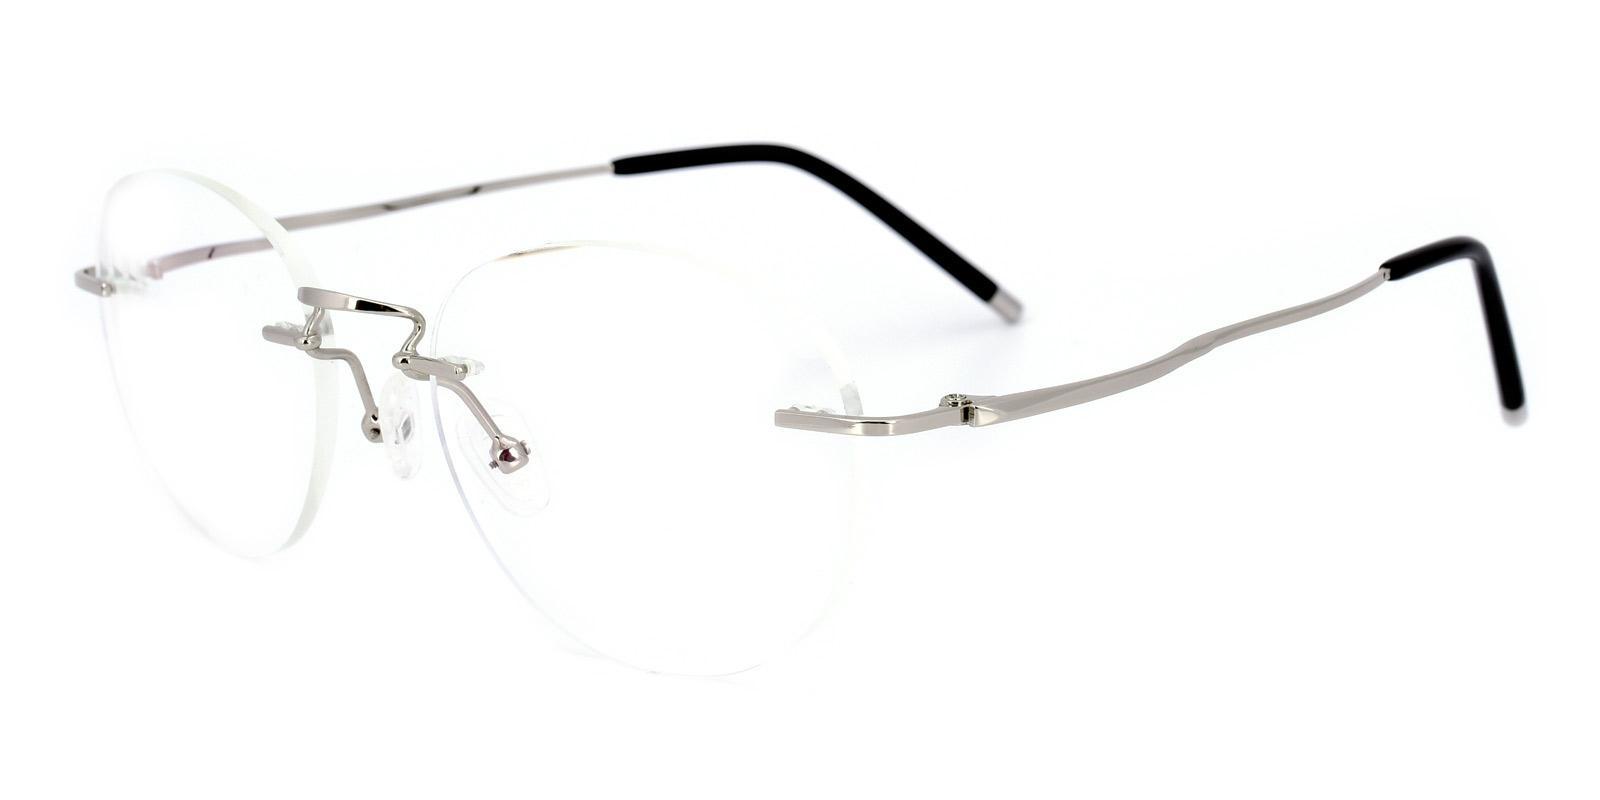 Pandimo-Silver-Varieties-Titanium-Eyeglasses-detail